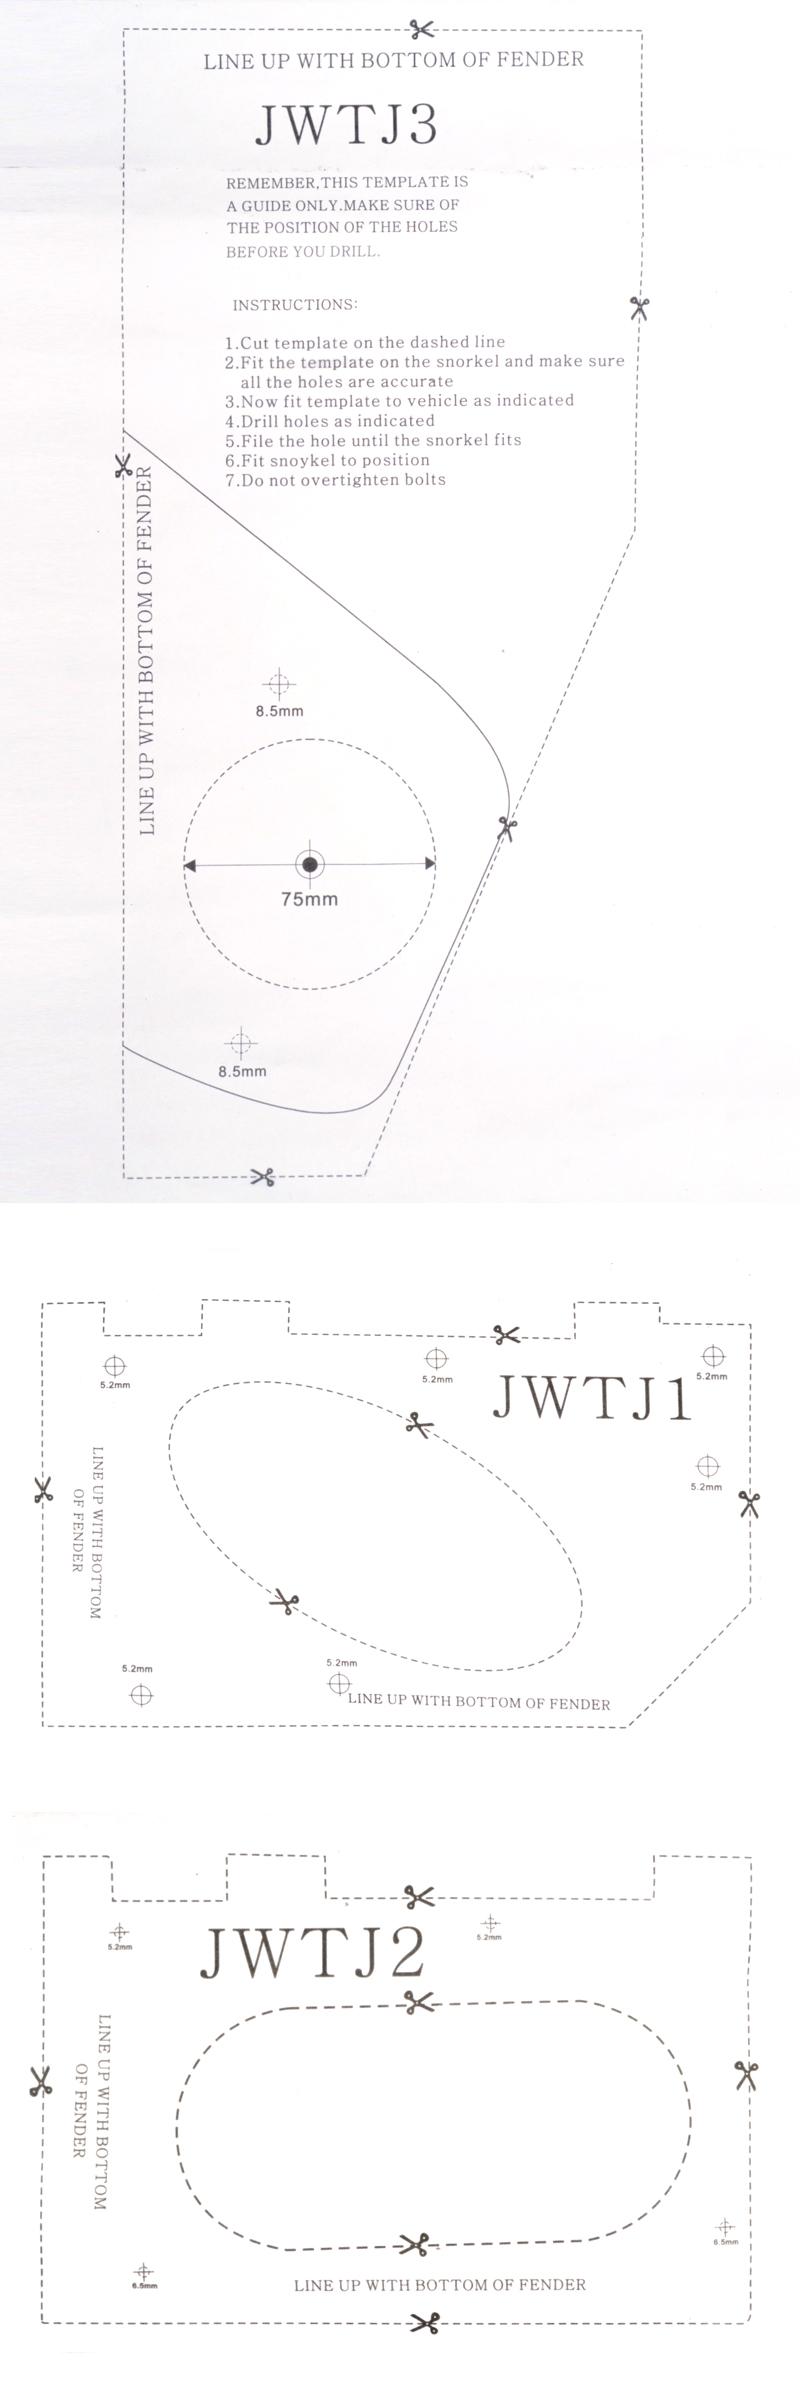 Assembly Instructions N Z T Motorsports Online Store Pv Wiring Diagram Nz Snorkel Sjxja Installation Manual